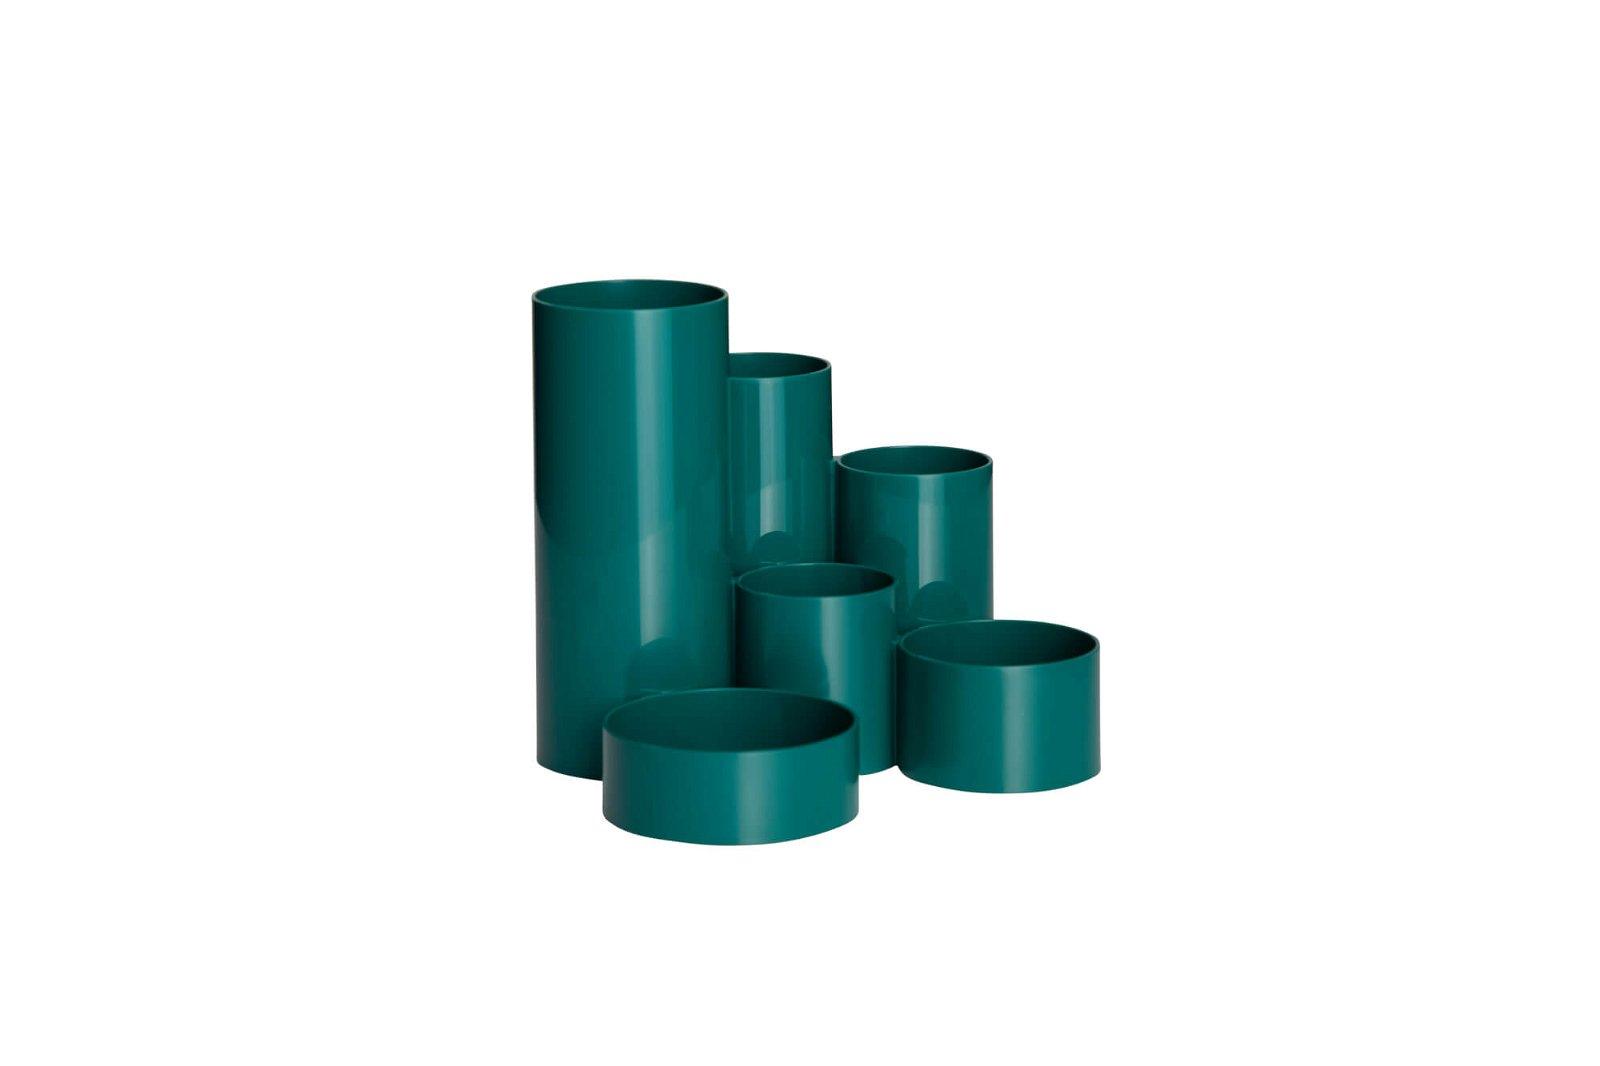 Stifteköcher MAULtubo grün